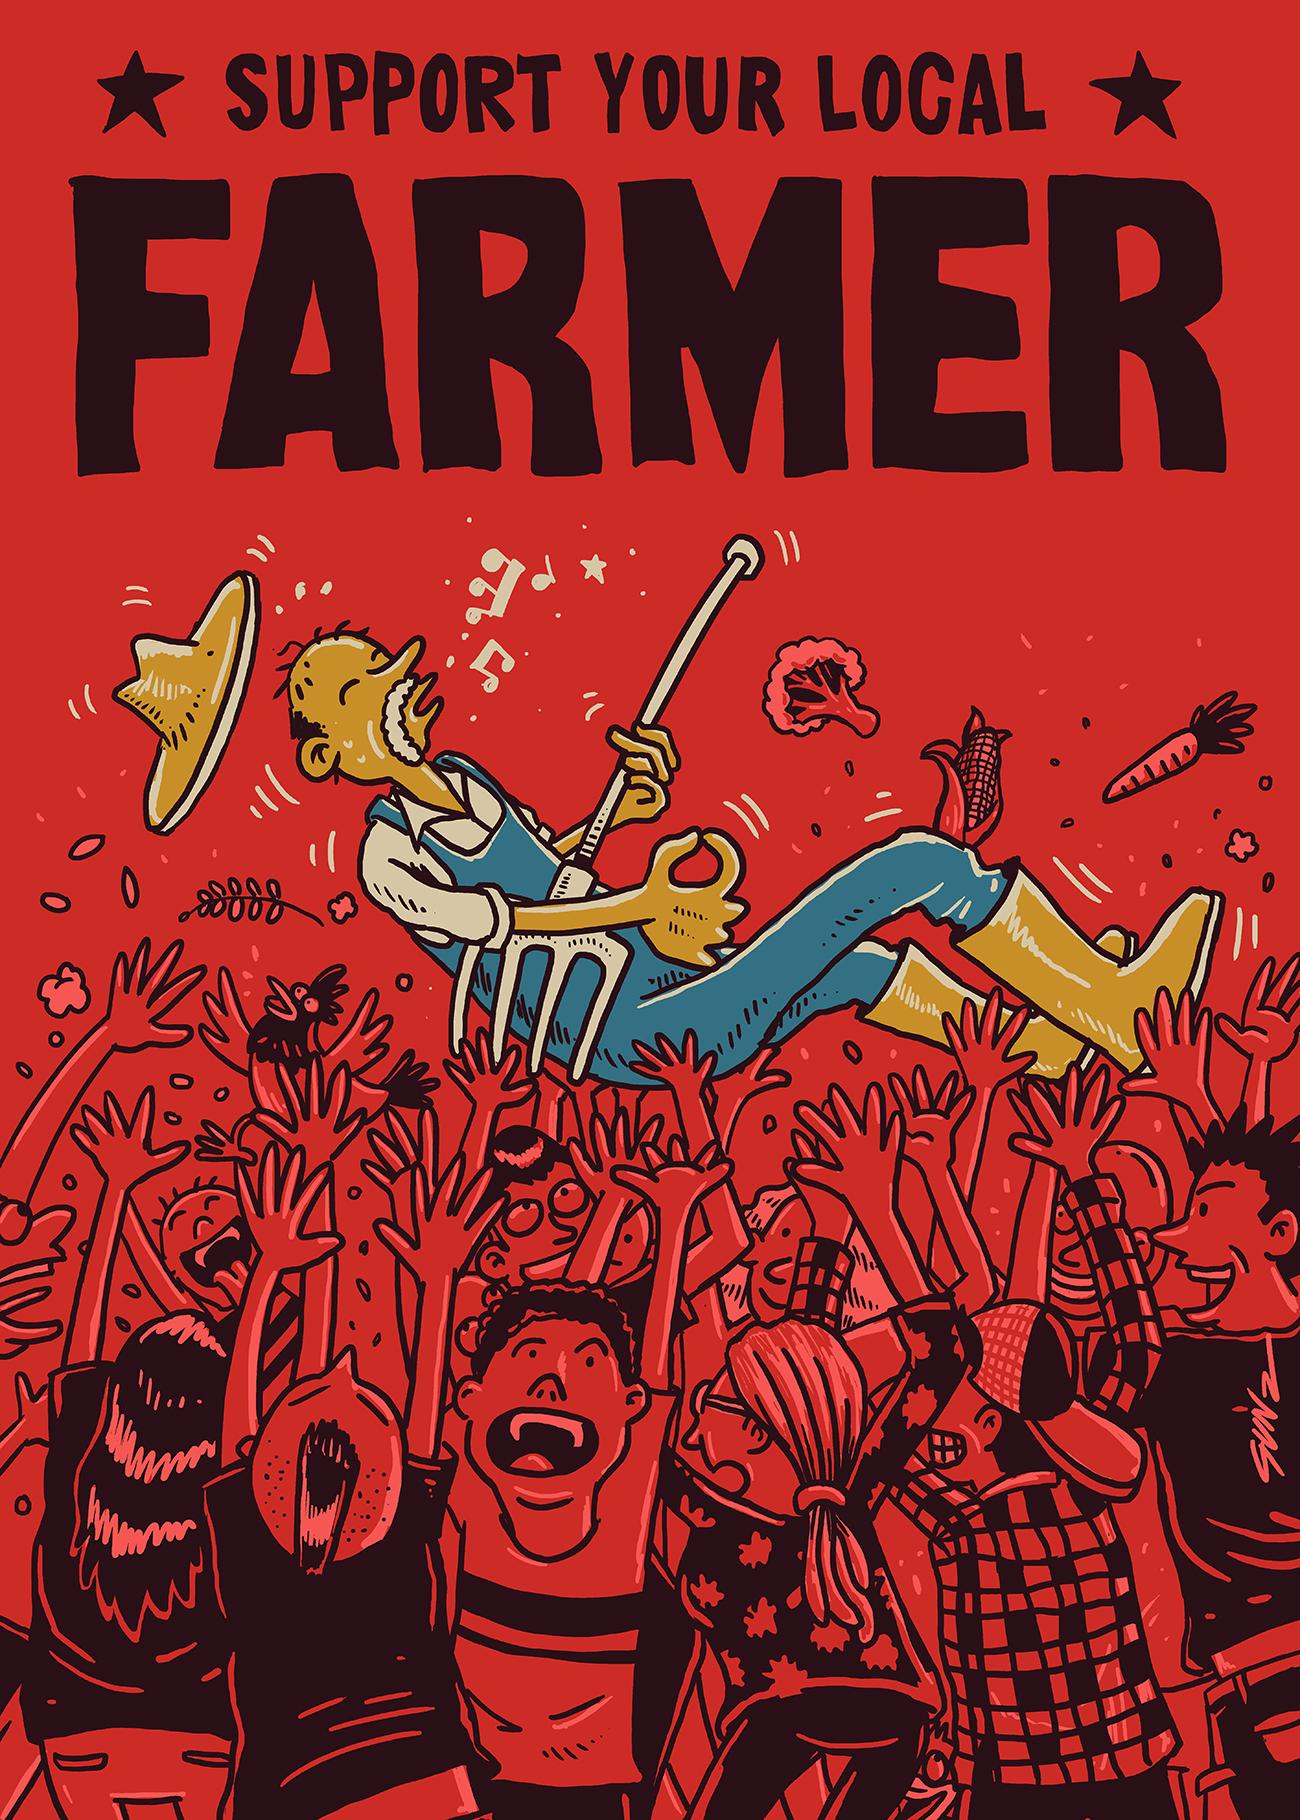 Support your local farmer by Gandhi Eka